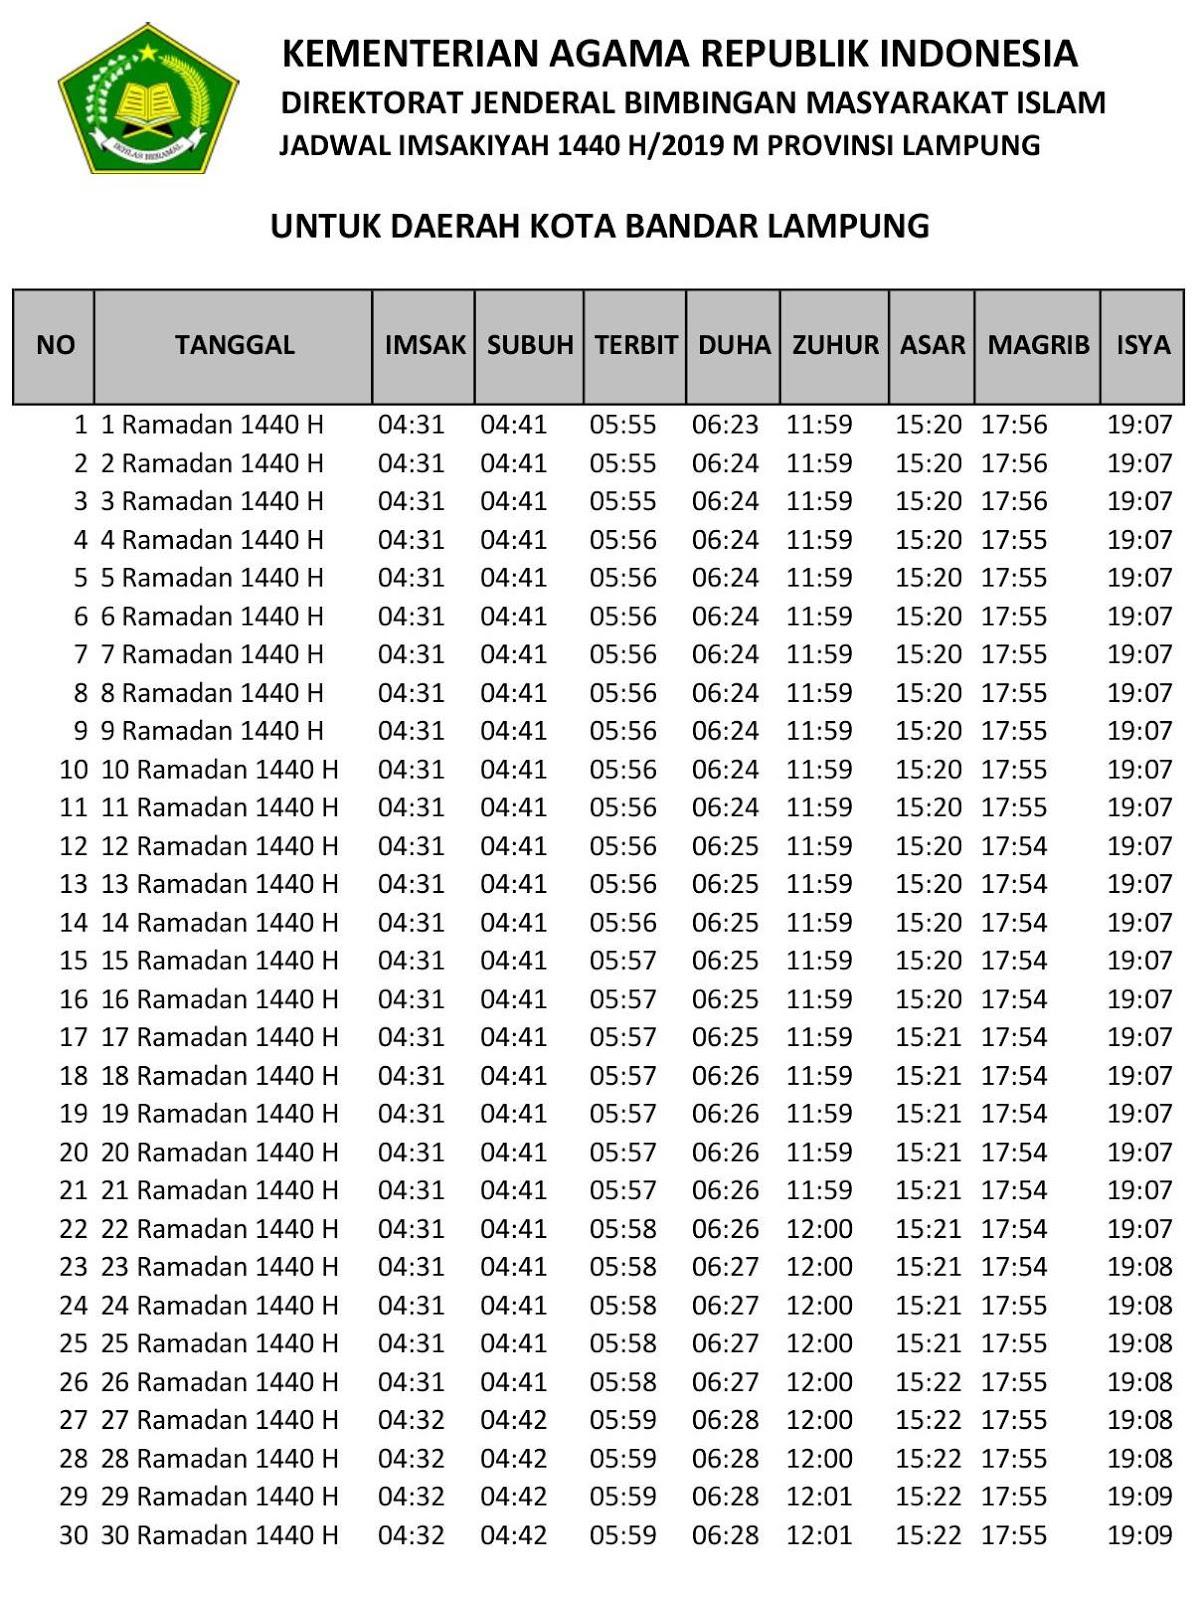 Jadwal Sholat Bandar Lampung-Ramadhan 2019-Waktu Maghrib, Waktu Imsak, dan Waktu Shubuh di Wilayah Kota Bandar Lampung dan Sekitarnya, Lampung-Bulan Puasa 2019-1440 Hijriyah.